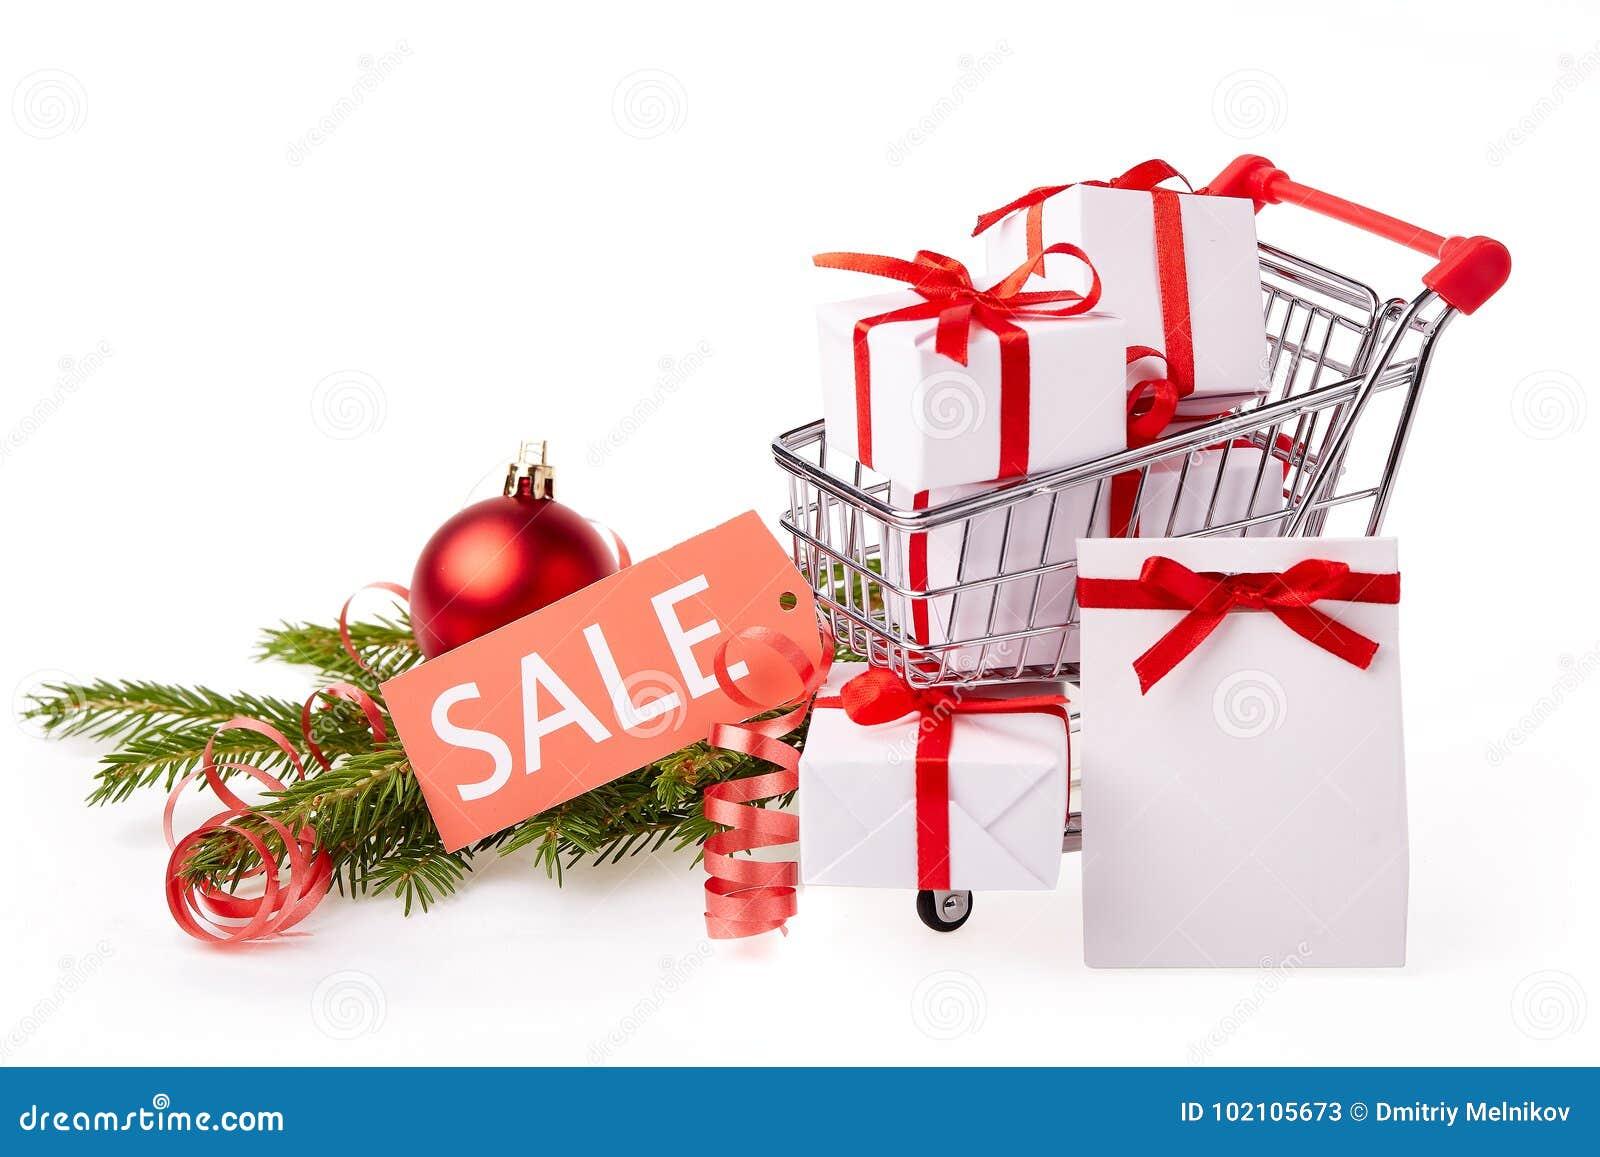 Christmas And New Year Shopping. Stock Image - Image of market ...